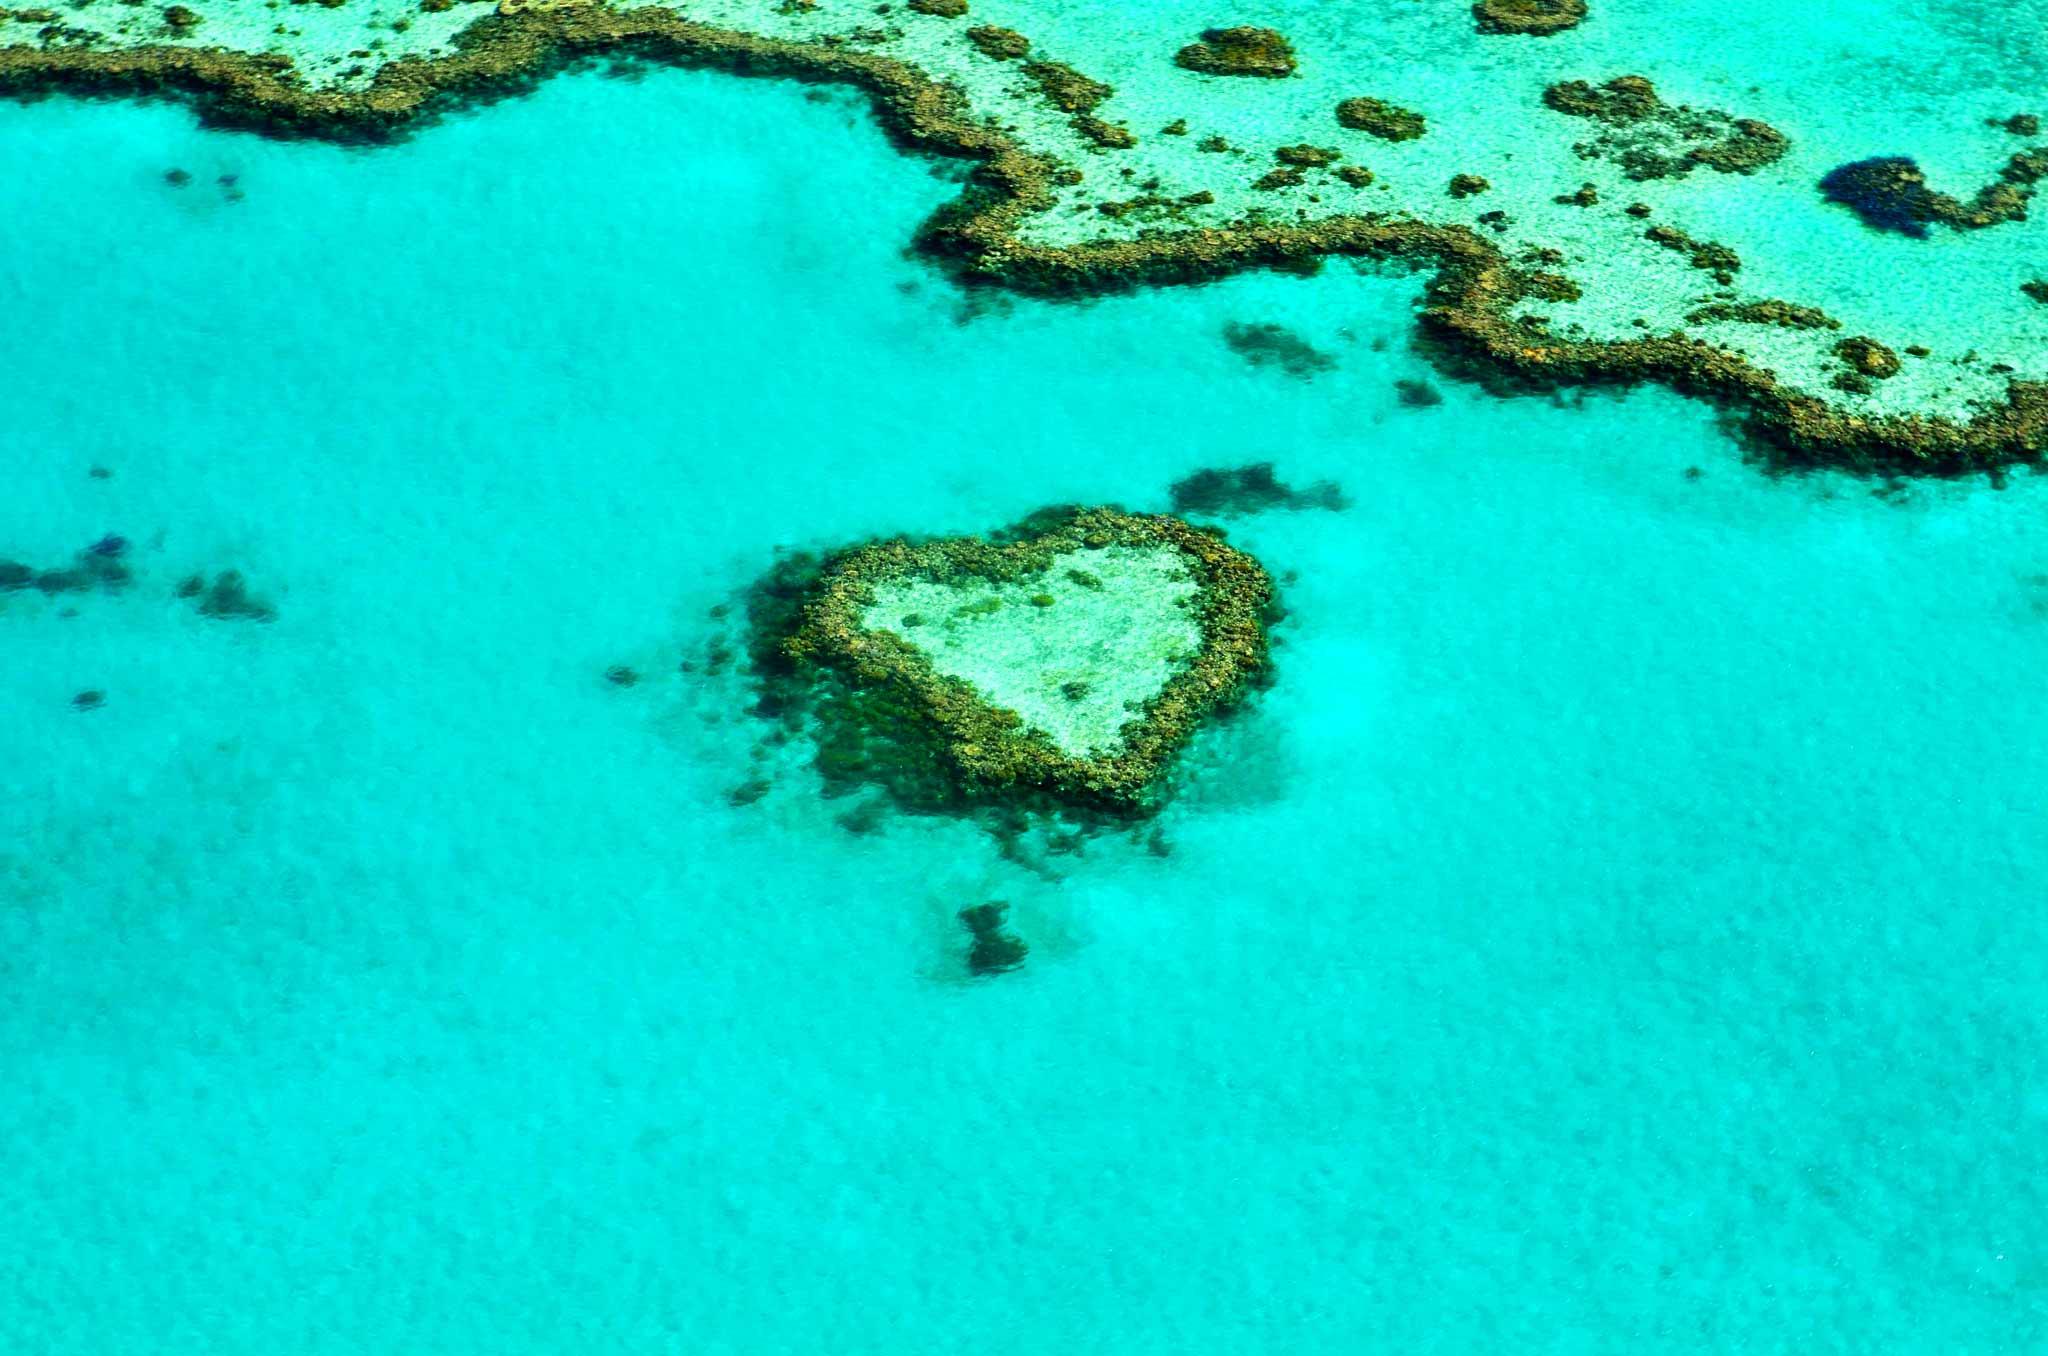 Australasian beach holiday